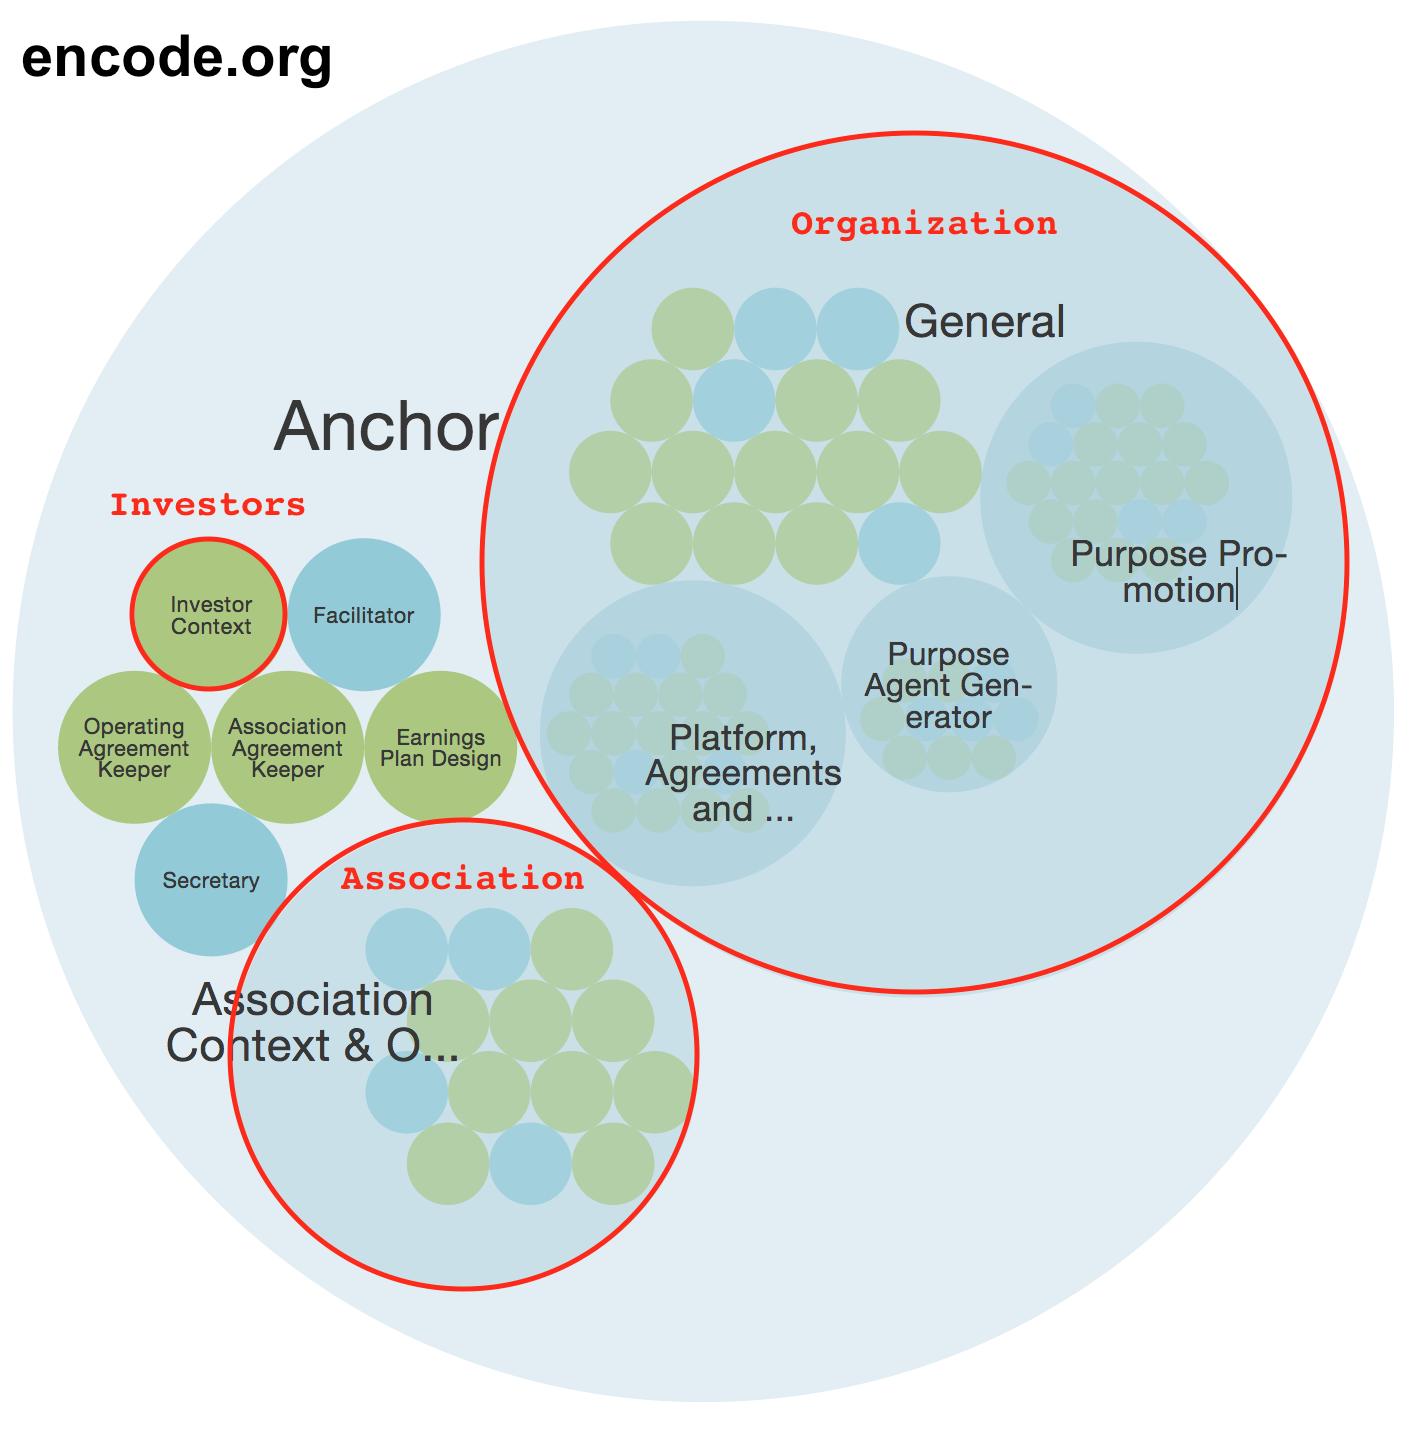 Snapshot of encode.org's structure captured in Glassfrog, July2017